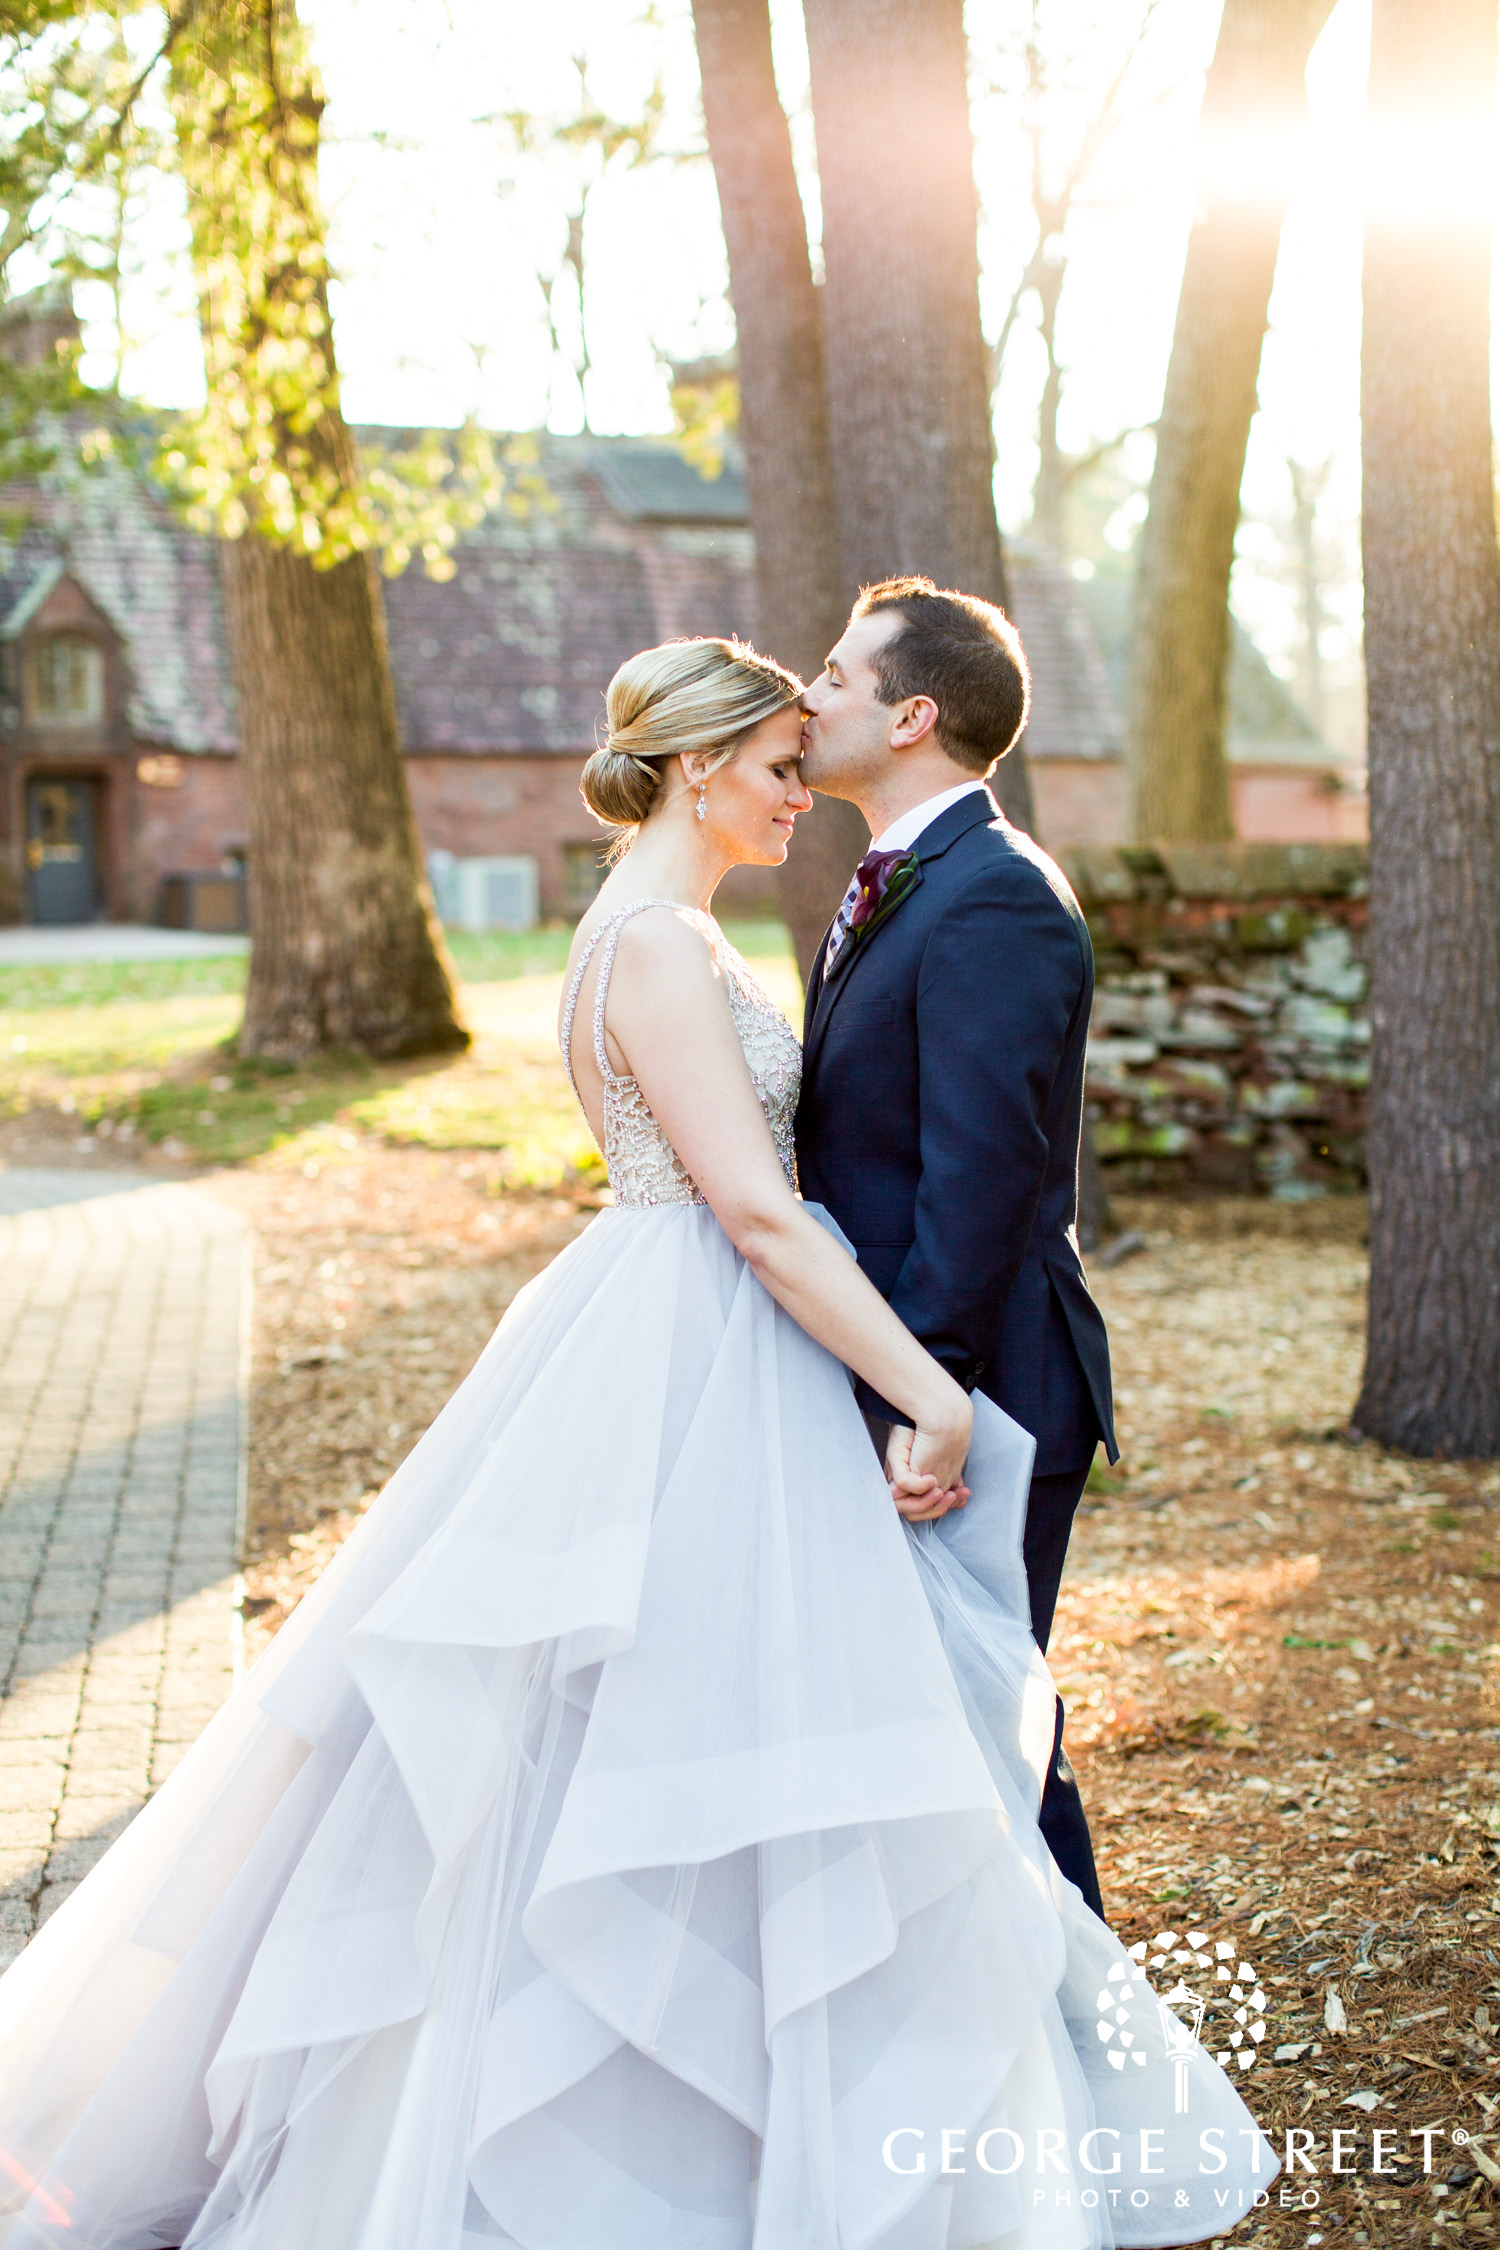 Hayley Paige wedding gown beautiful wedding portrait